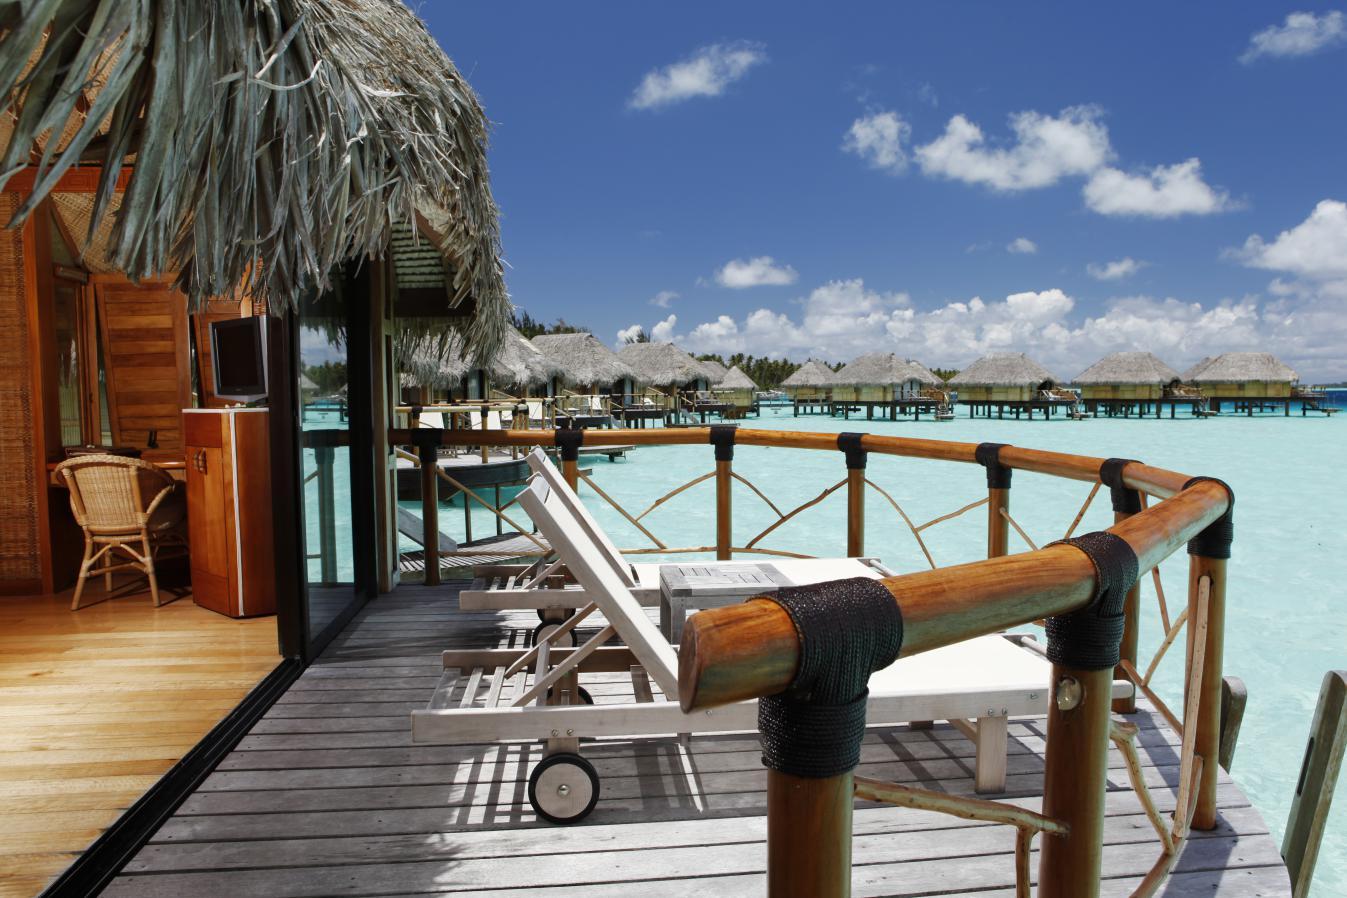 Mejor Overwater Bungalows Faceoff Bora Bora o Maldivas